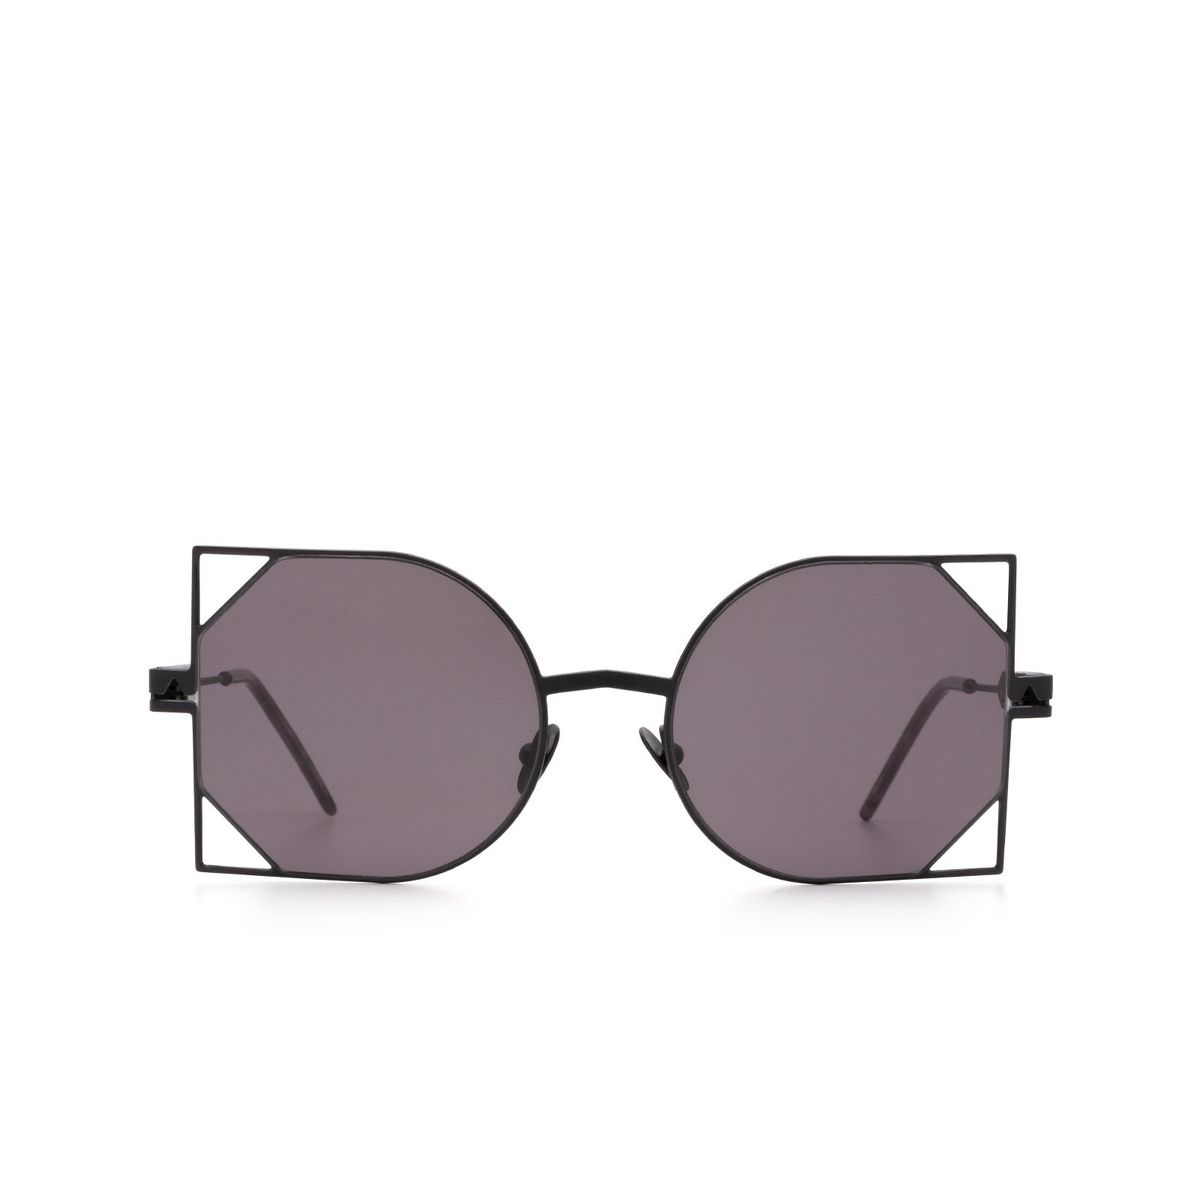 Soya® Irregular Sunglasses: Rania color Matte Black & Shiny Gold Bkg-fs.